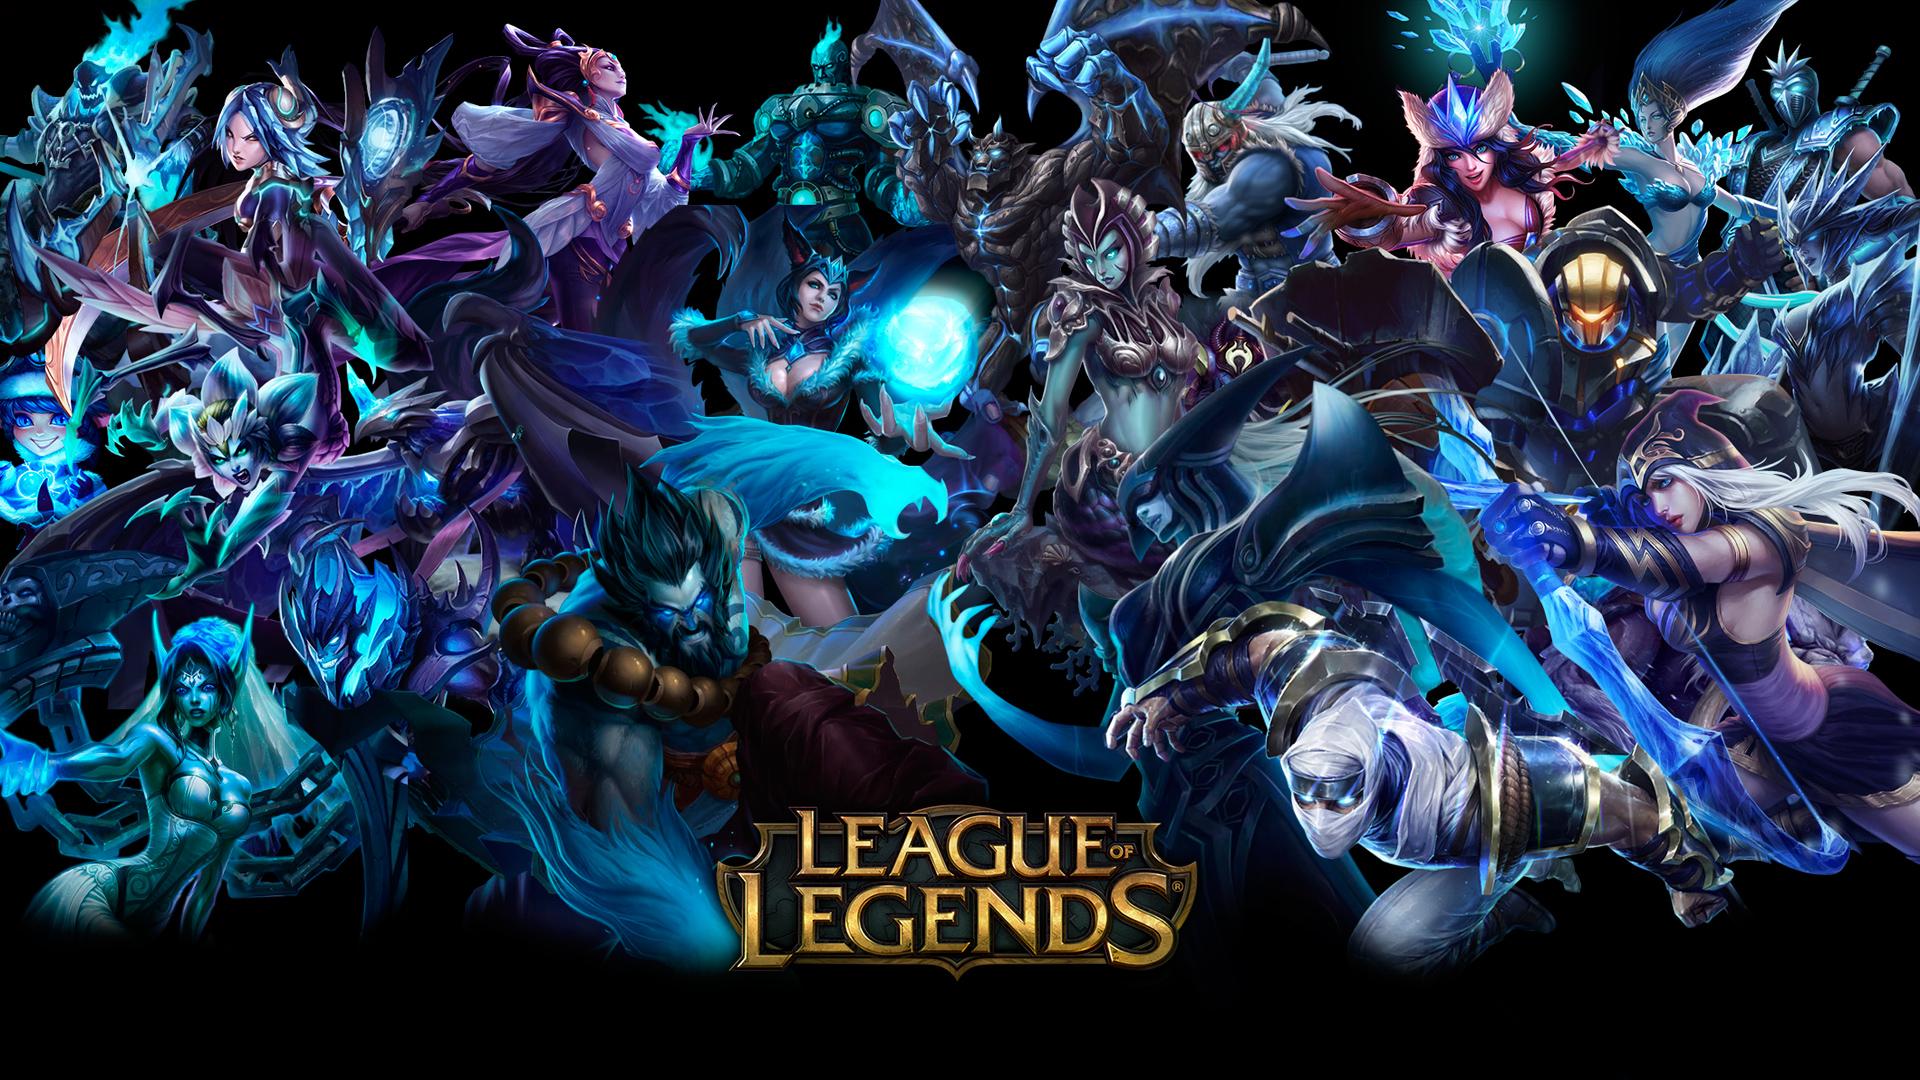 League Of Legends 1920x1080 1m HD Wallpaper